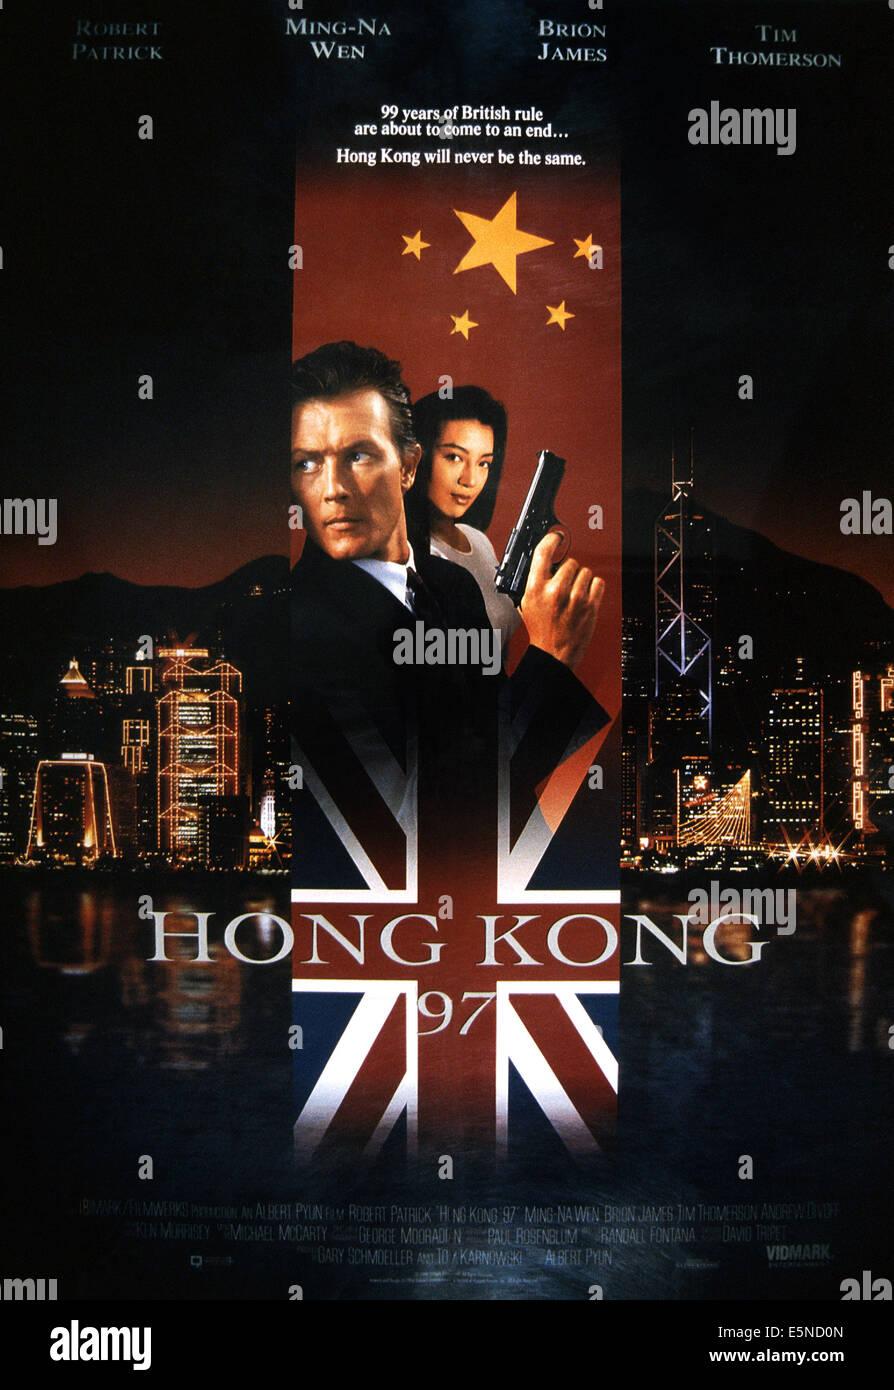 HONG KONG 97, from left: Robert Patrick, Mong-Na Wen, 1994, © Trimark/courtesy Everett Collection - Stock Image